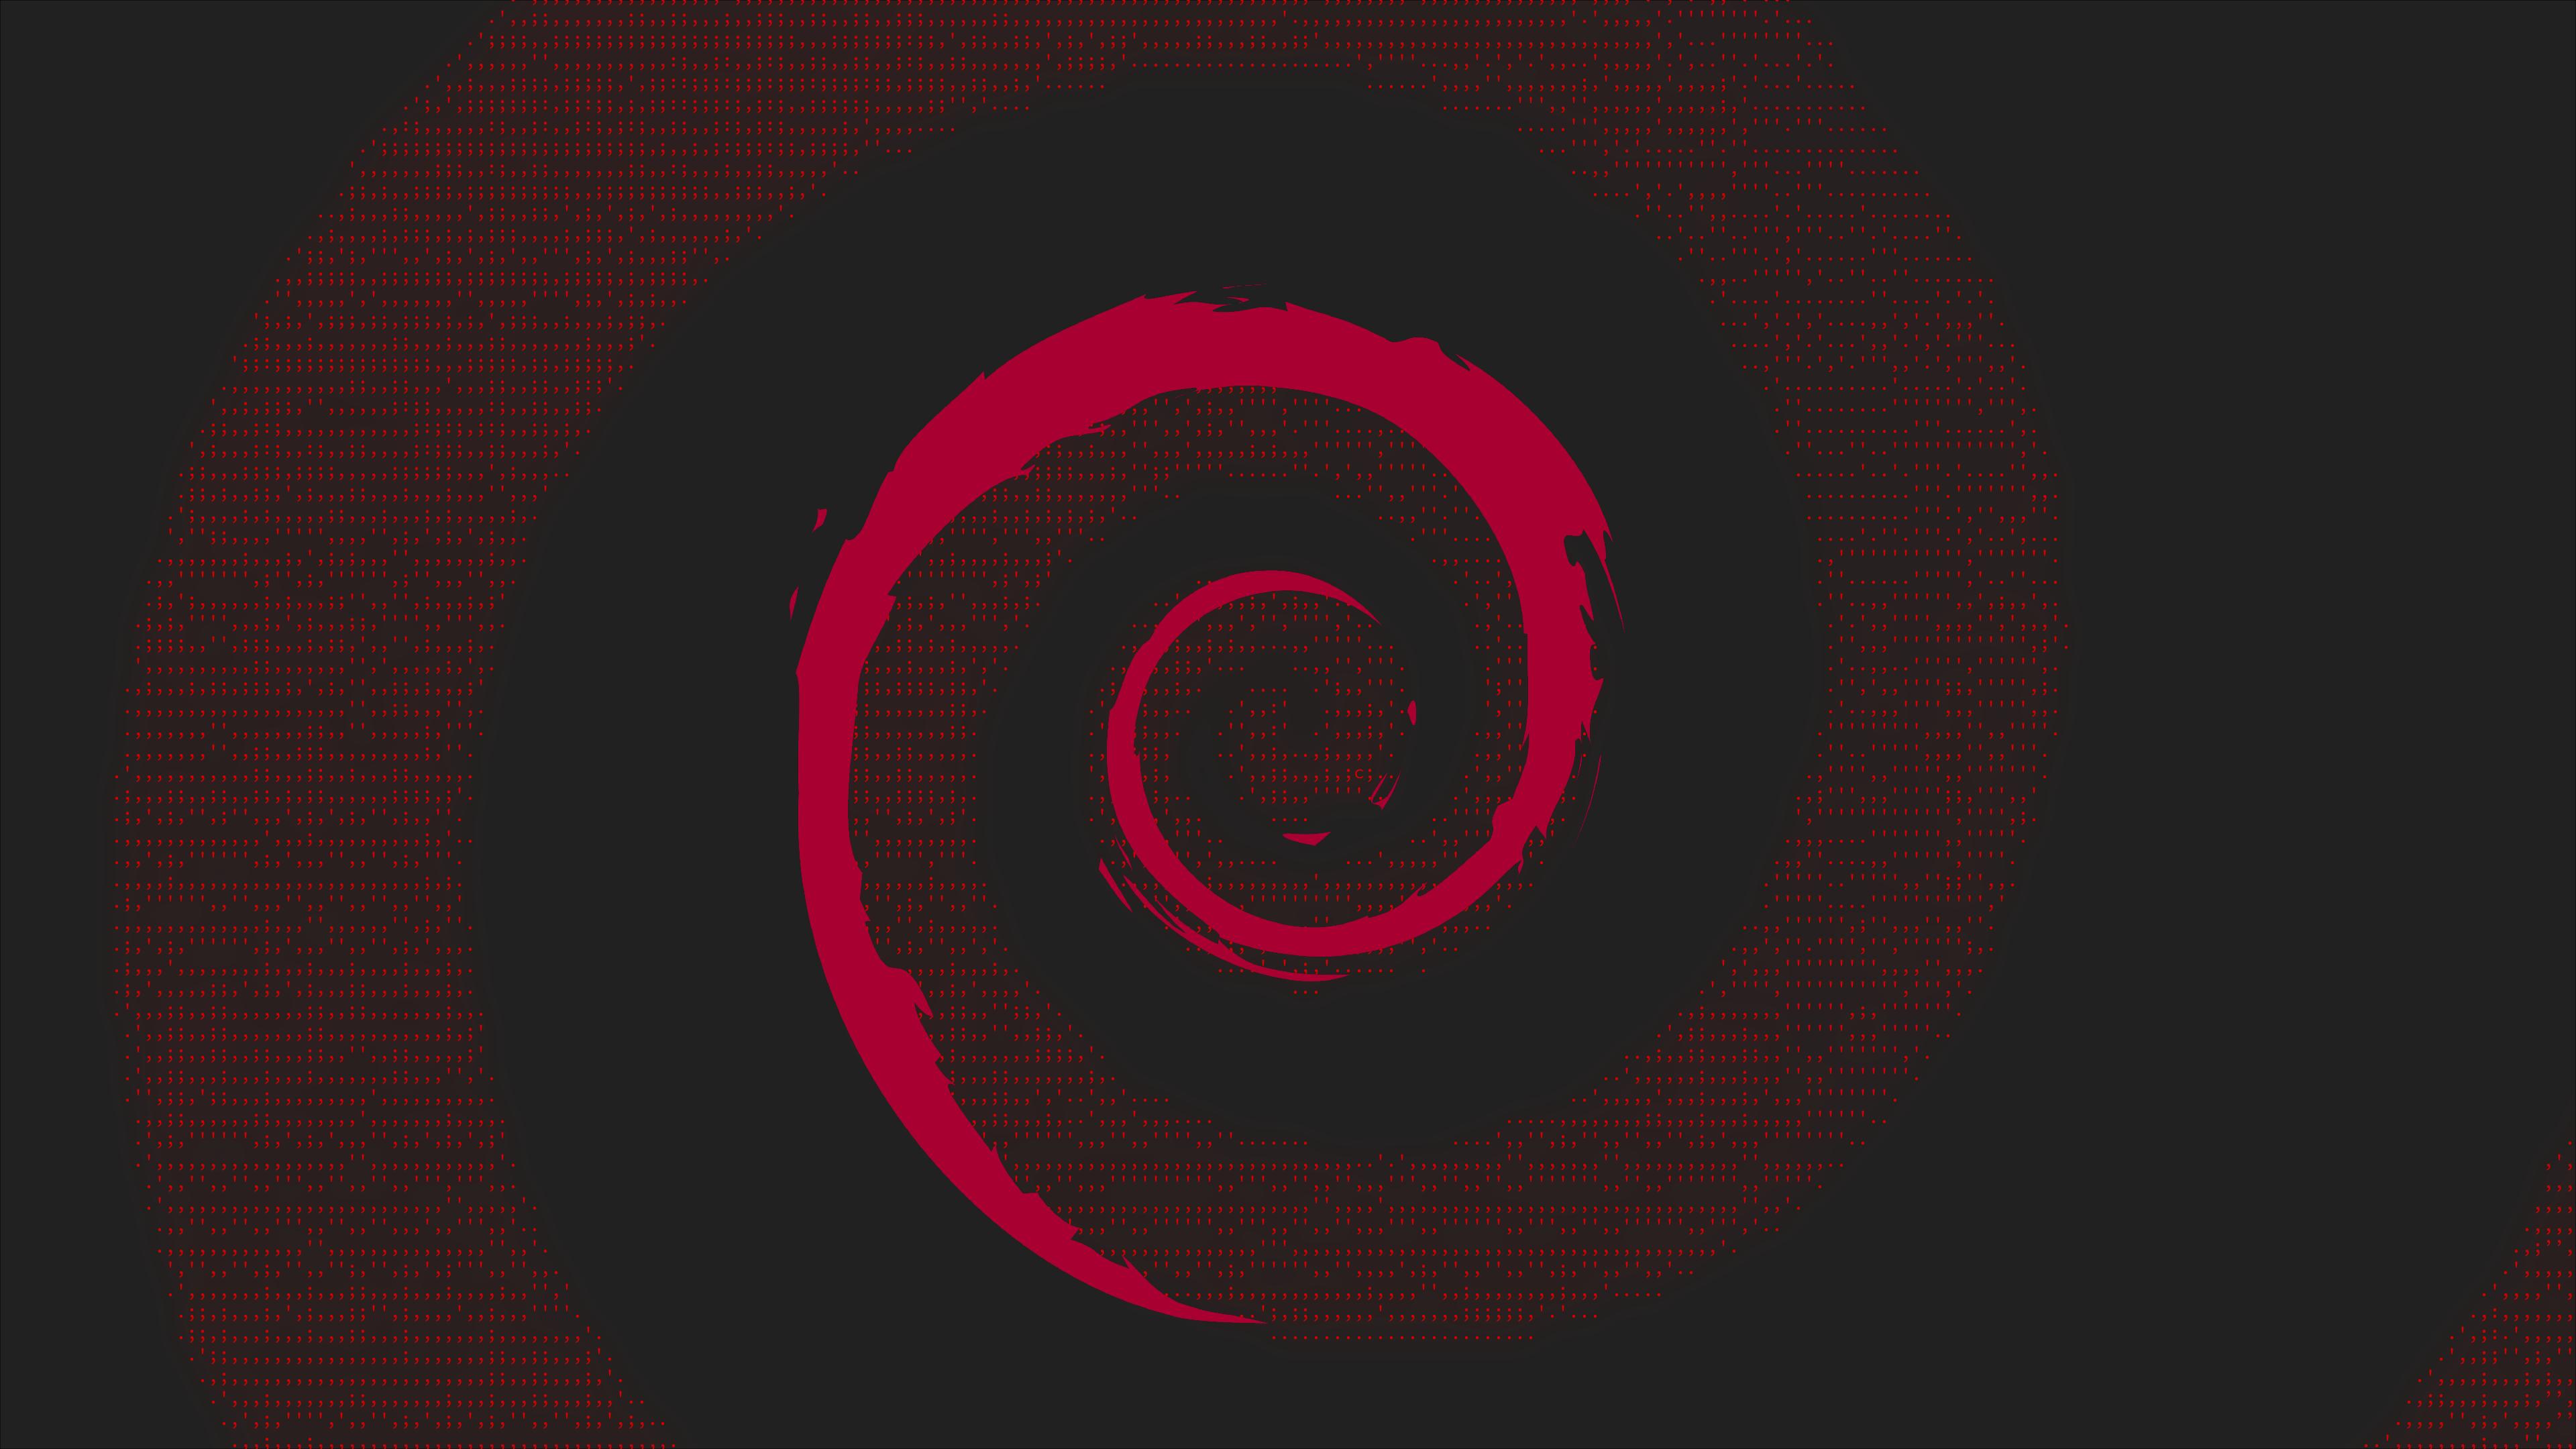 Wallpaper Debian Linux Minimalism Material Minimal Neon Glow